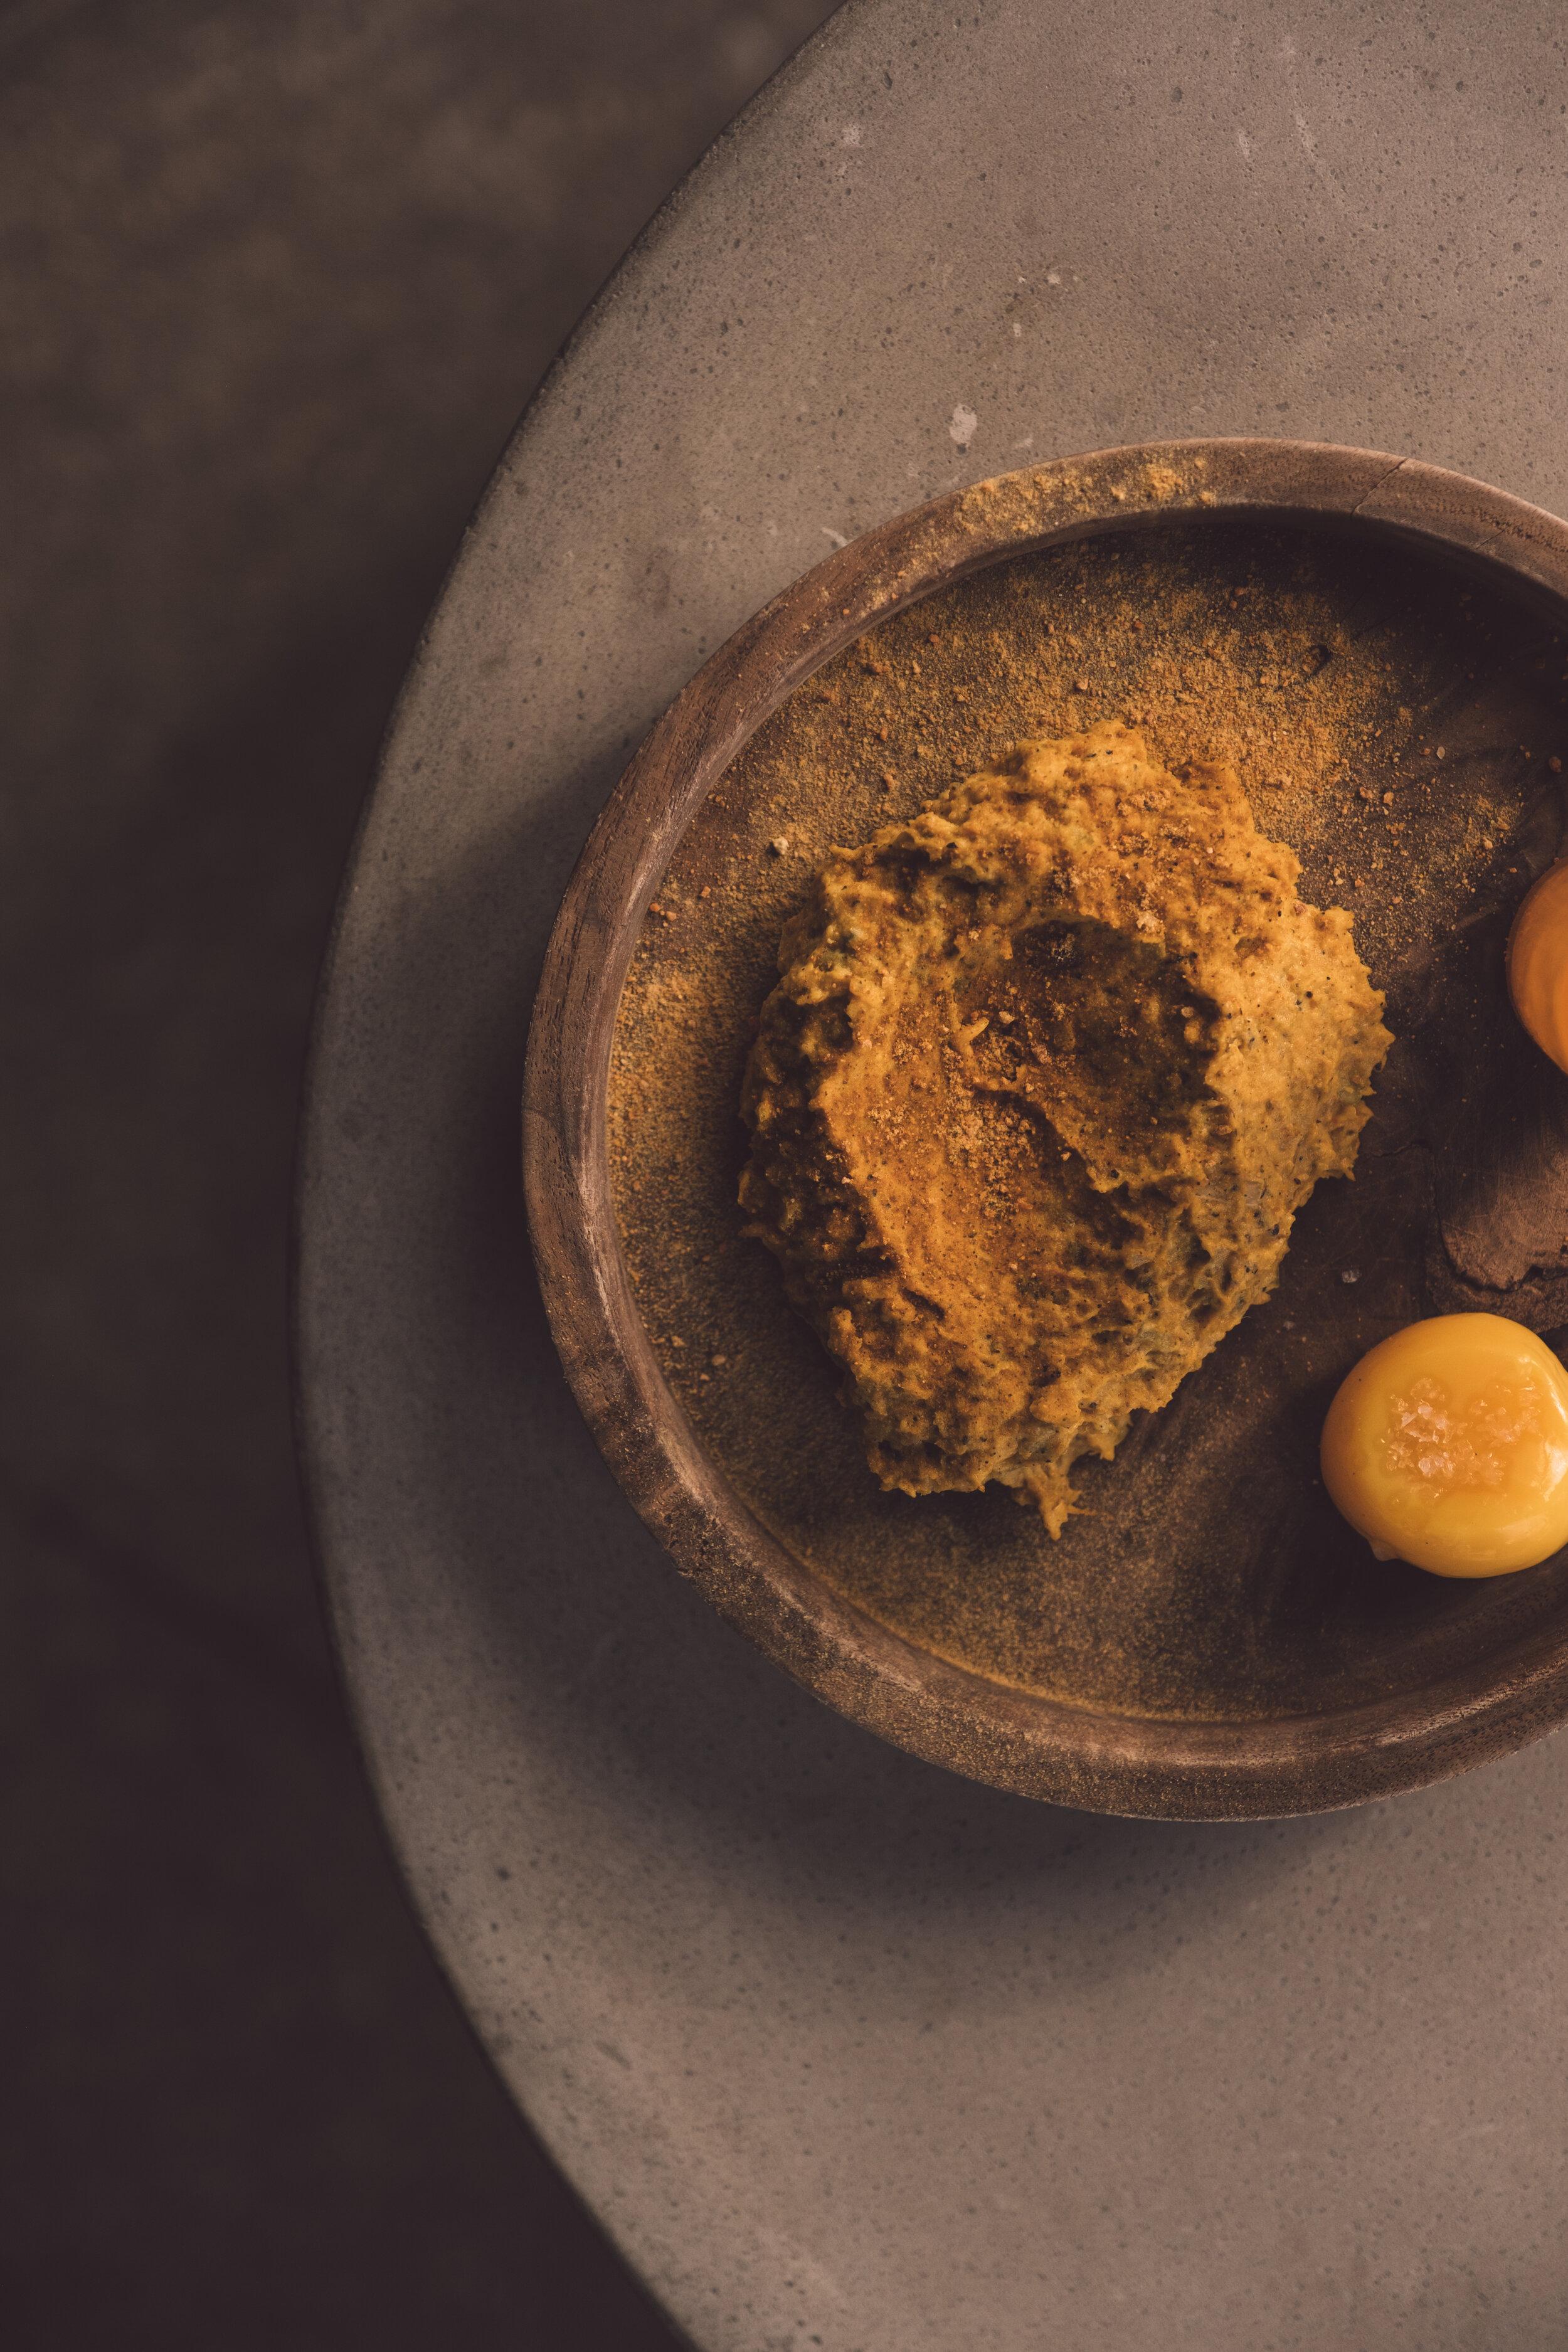 food_photography_styling_novel_attilio.jpg